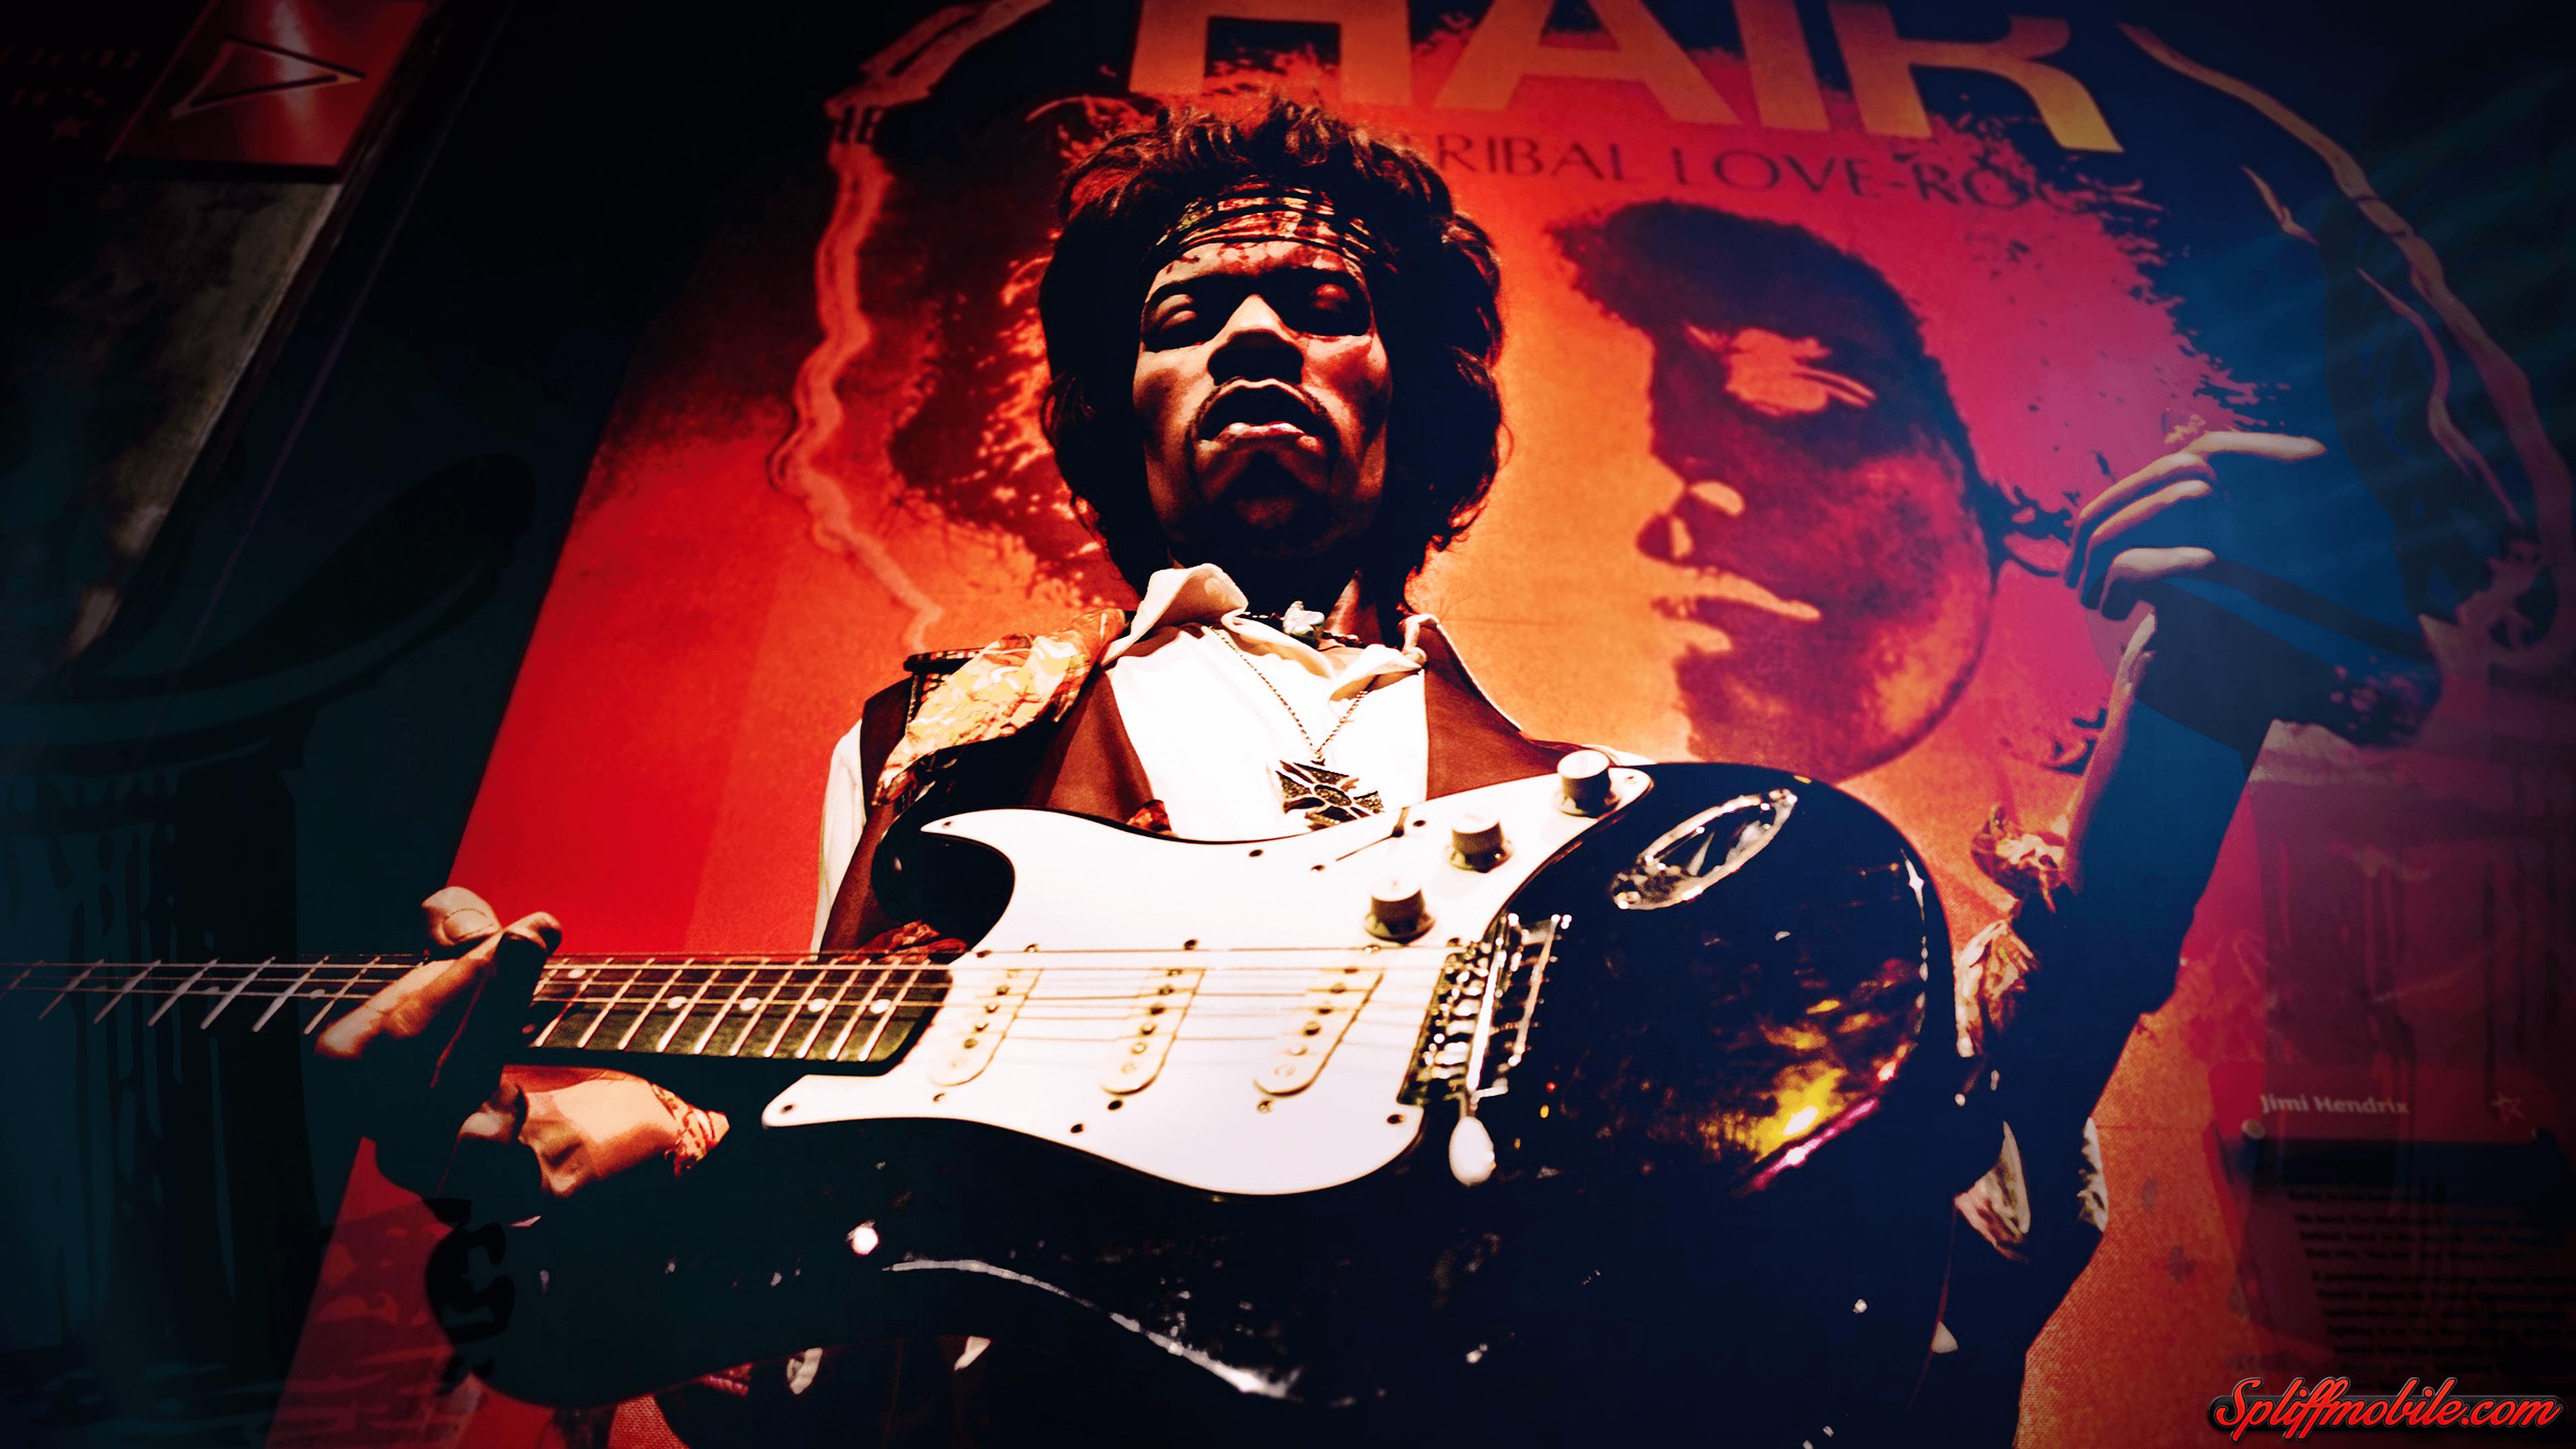 Jimi Hendrix 2017 Wallpapers - Wallpaper Cave